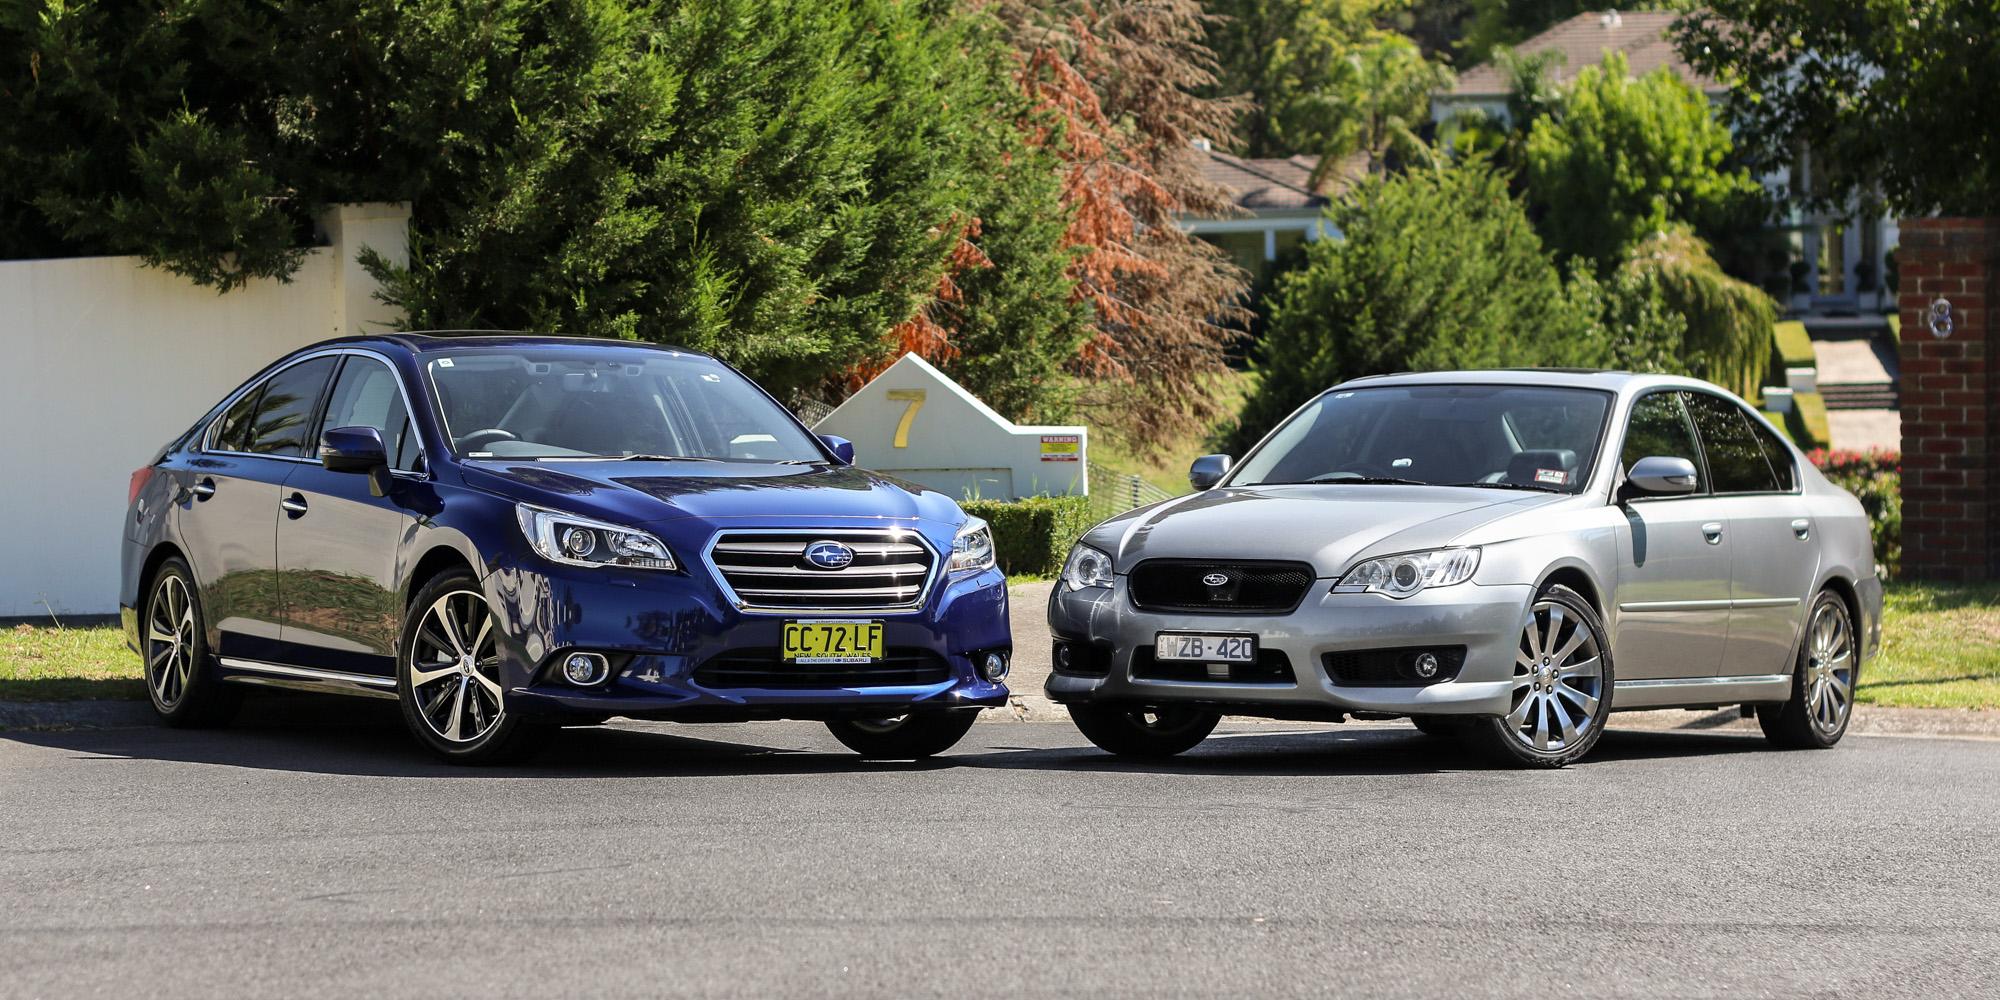 Subaru Liberty Old v New Comparison: Fourth-generation 3 0R v sixth